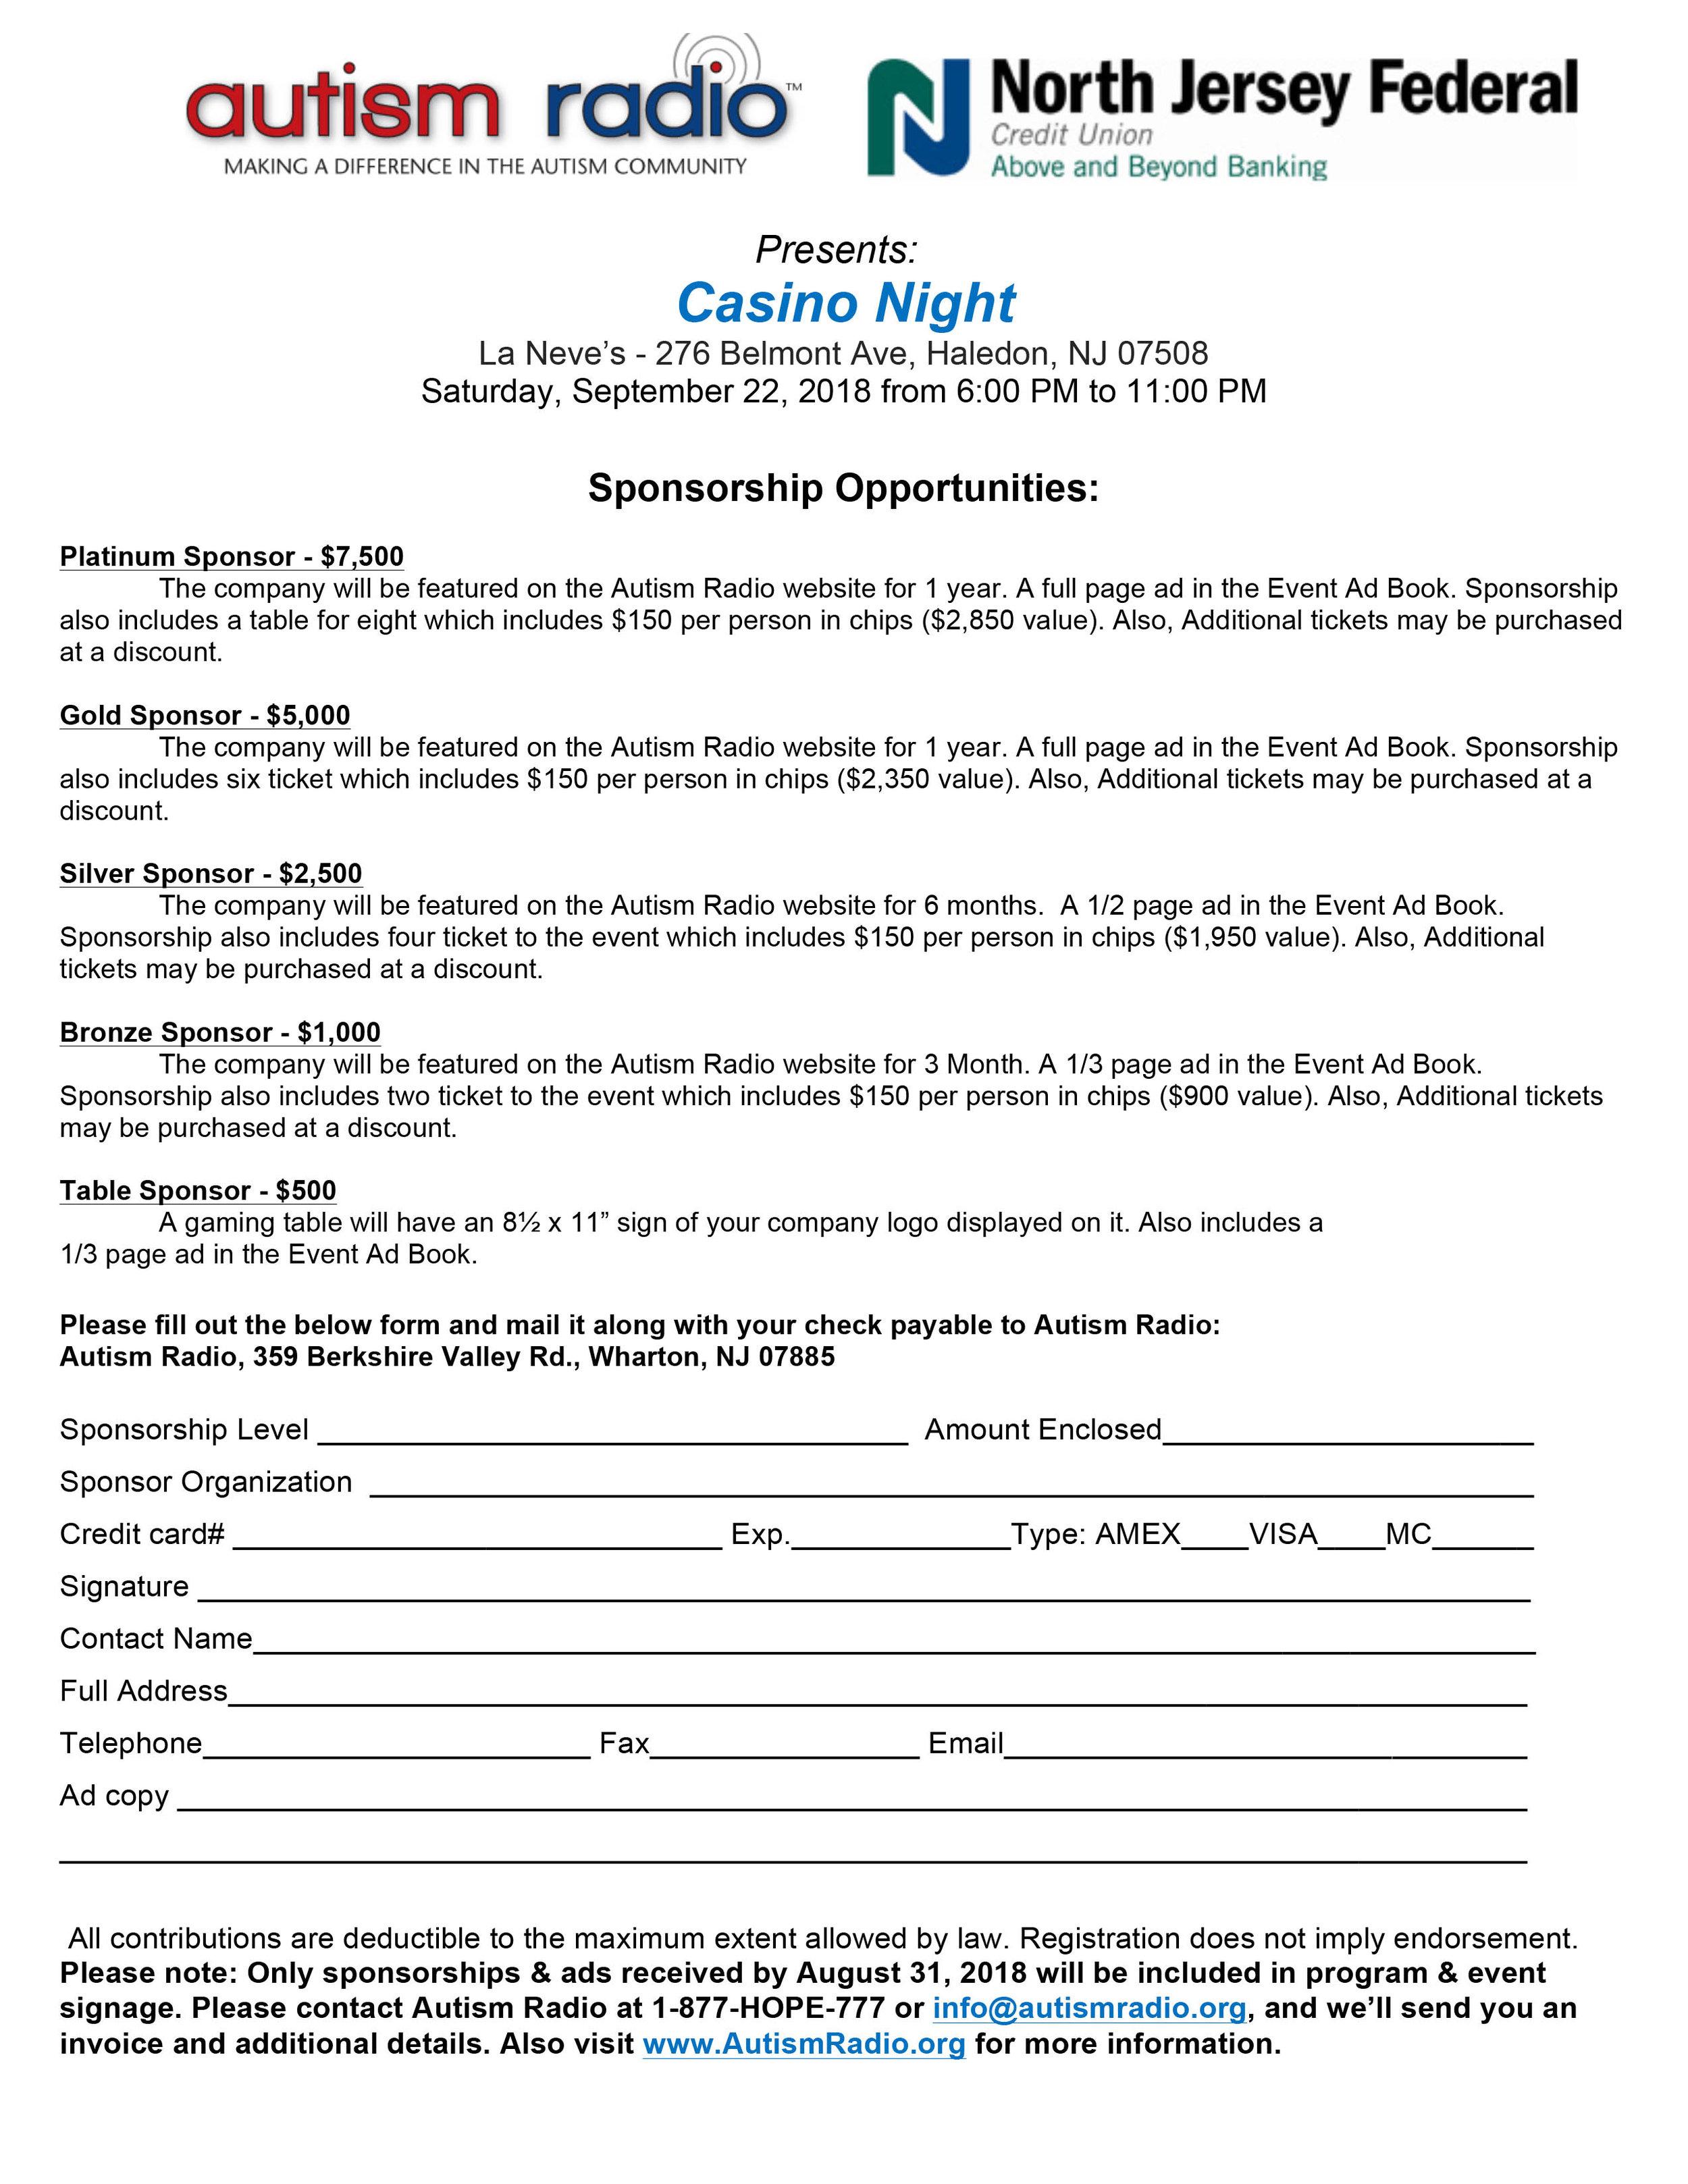 Casino Night Sponsorship form 2018.jpg